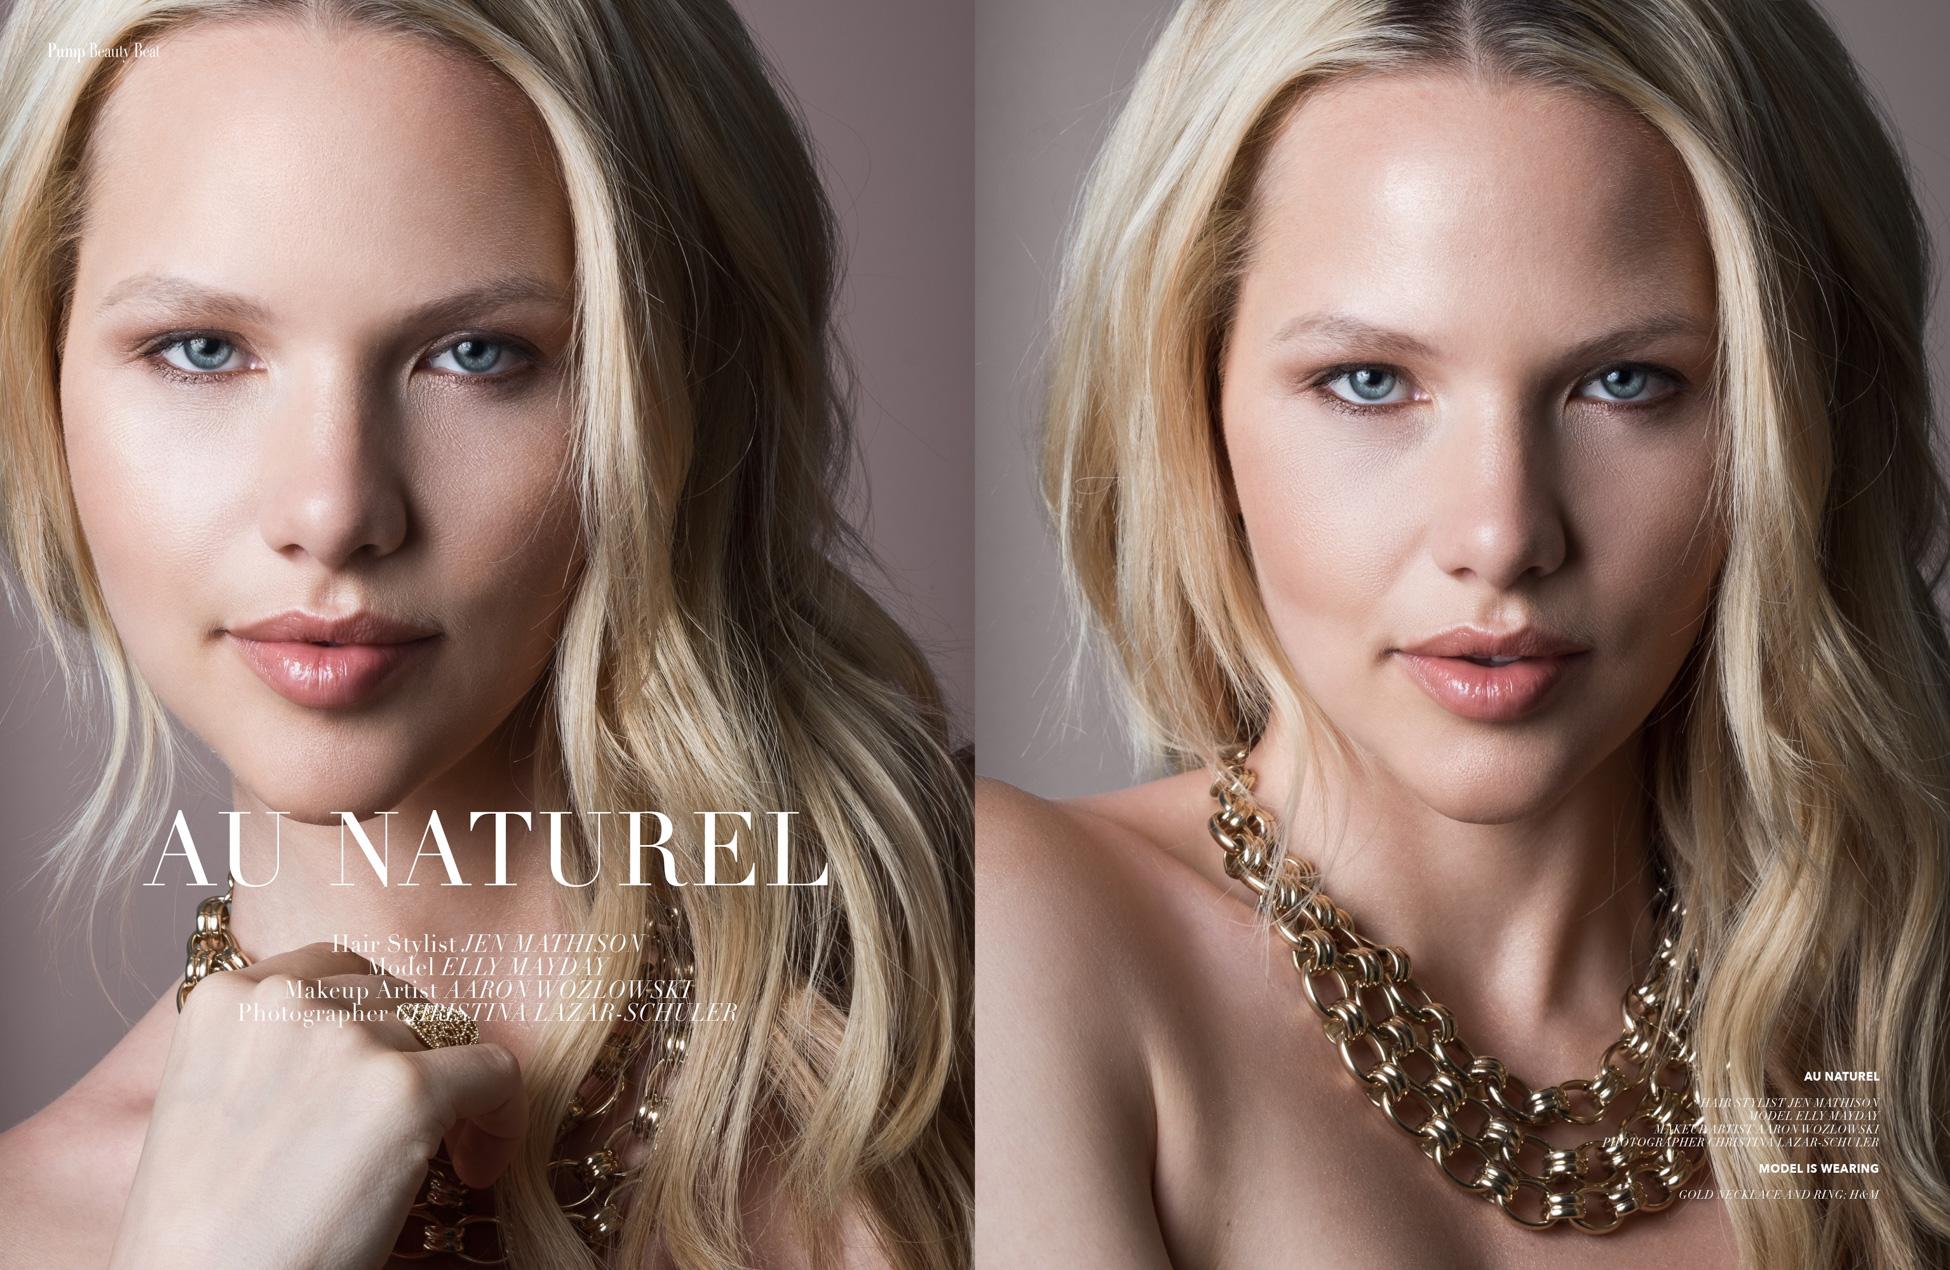 Beauty Vol 1 August 114.jpg